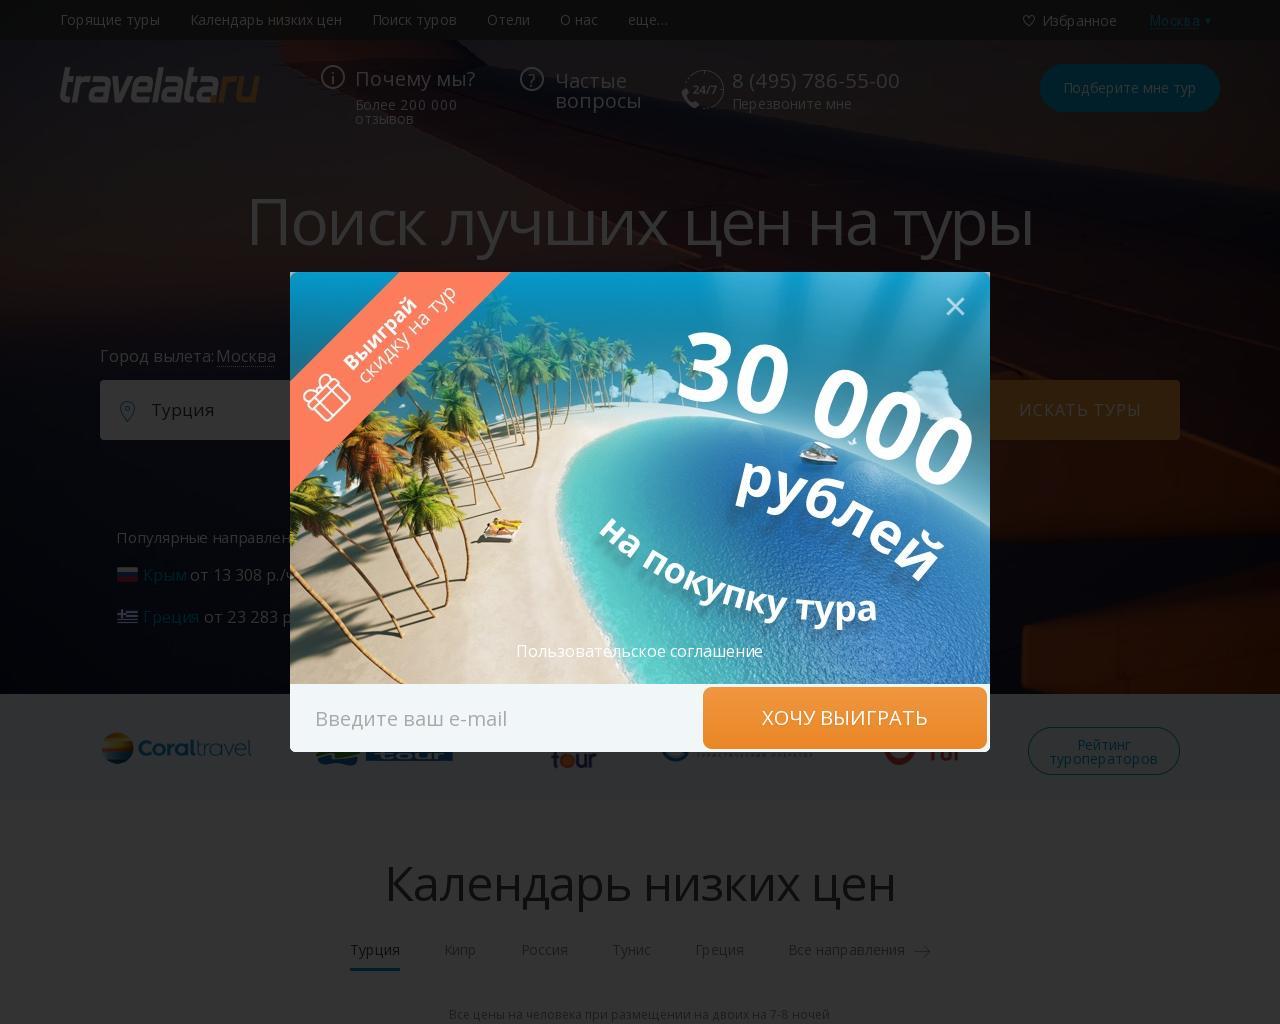 Покупка туров онлайн из москвы